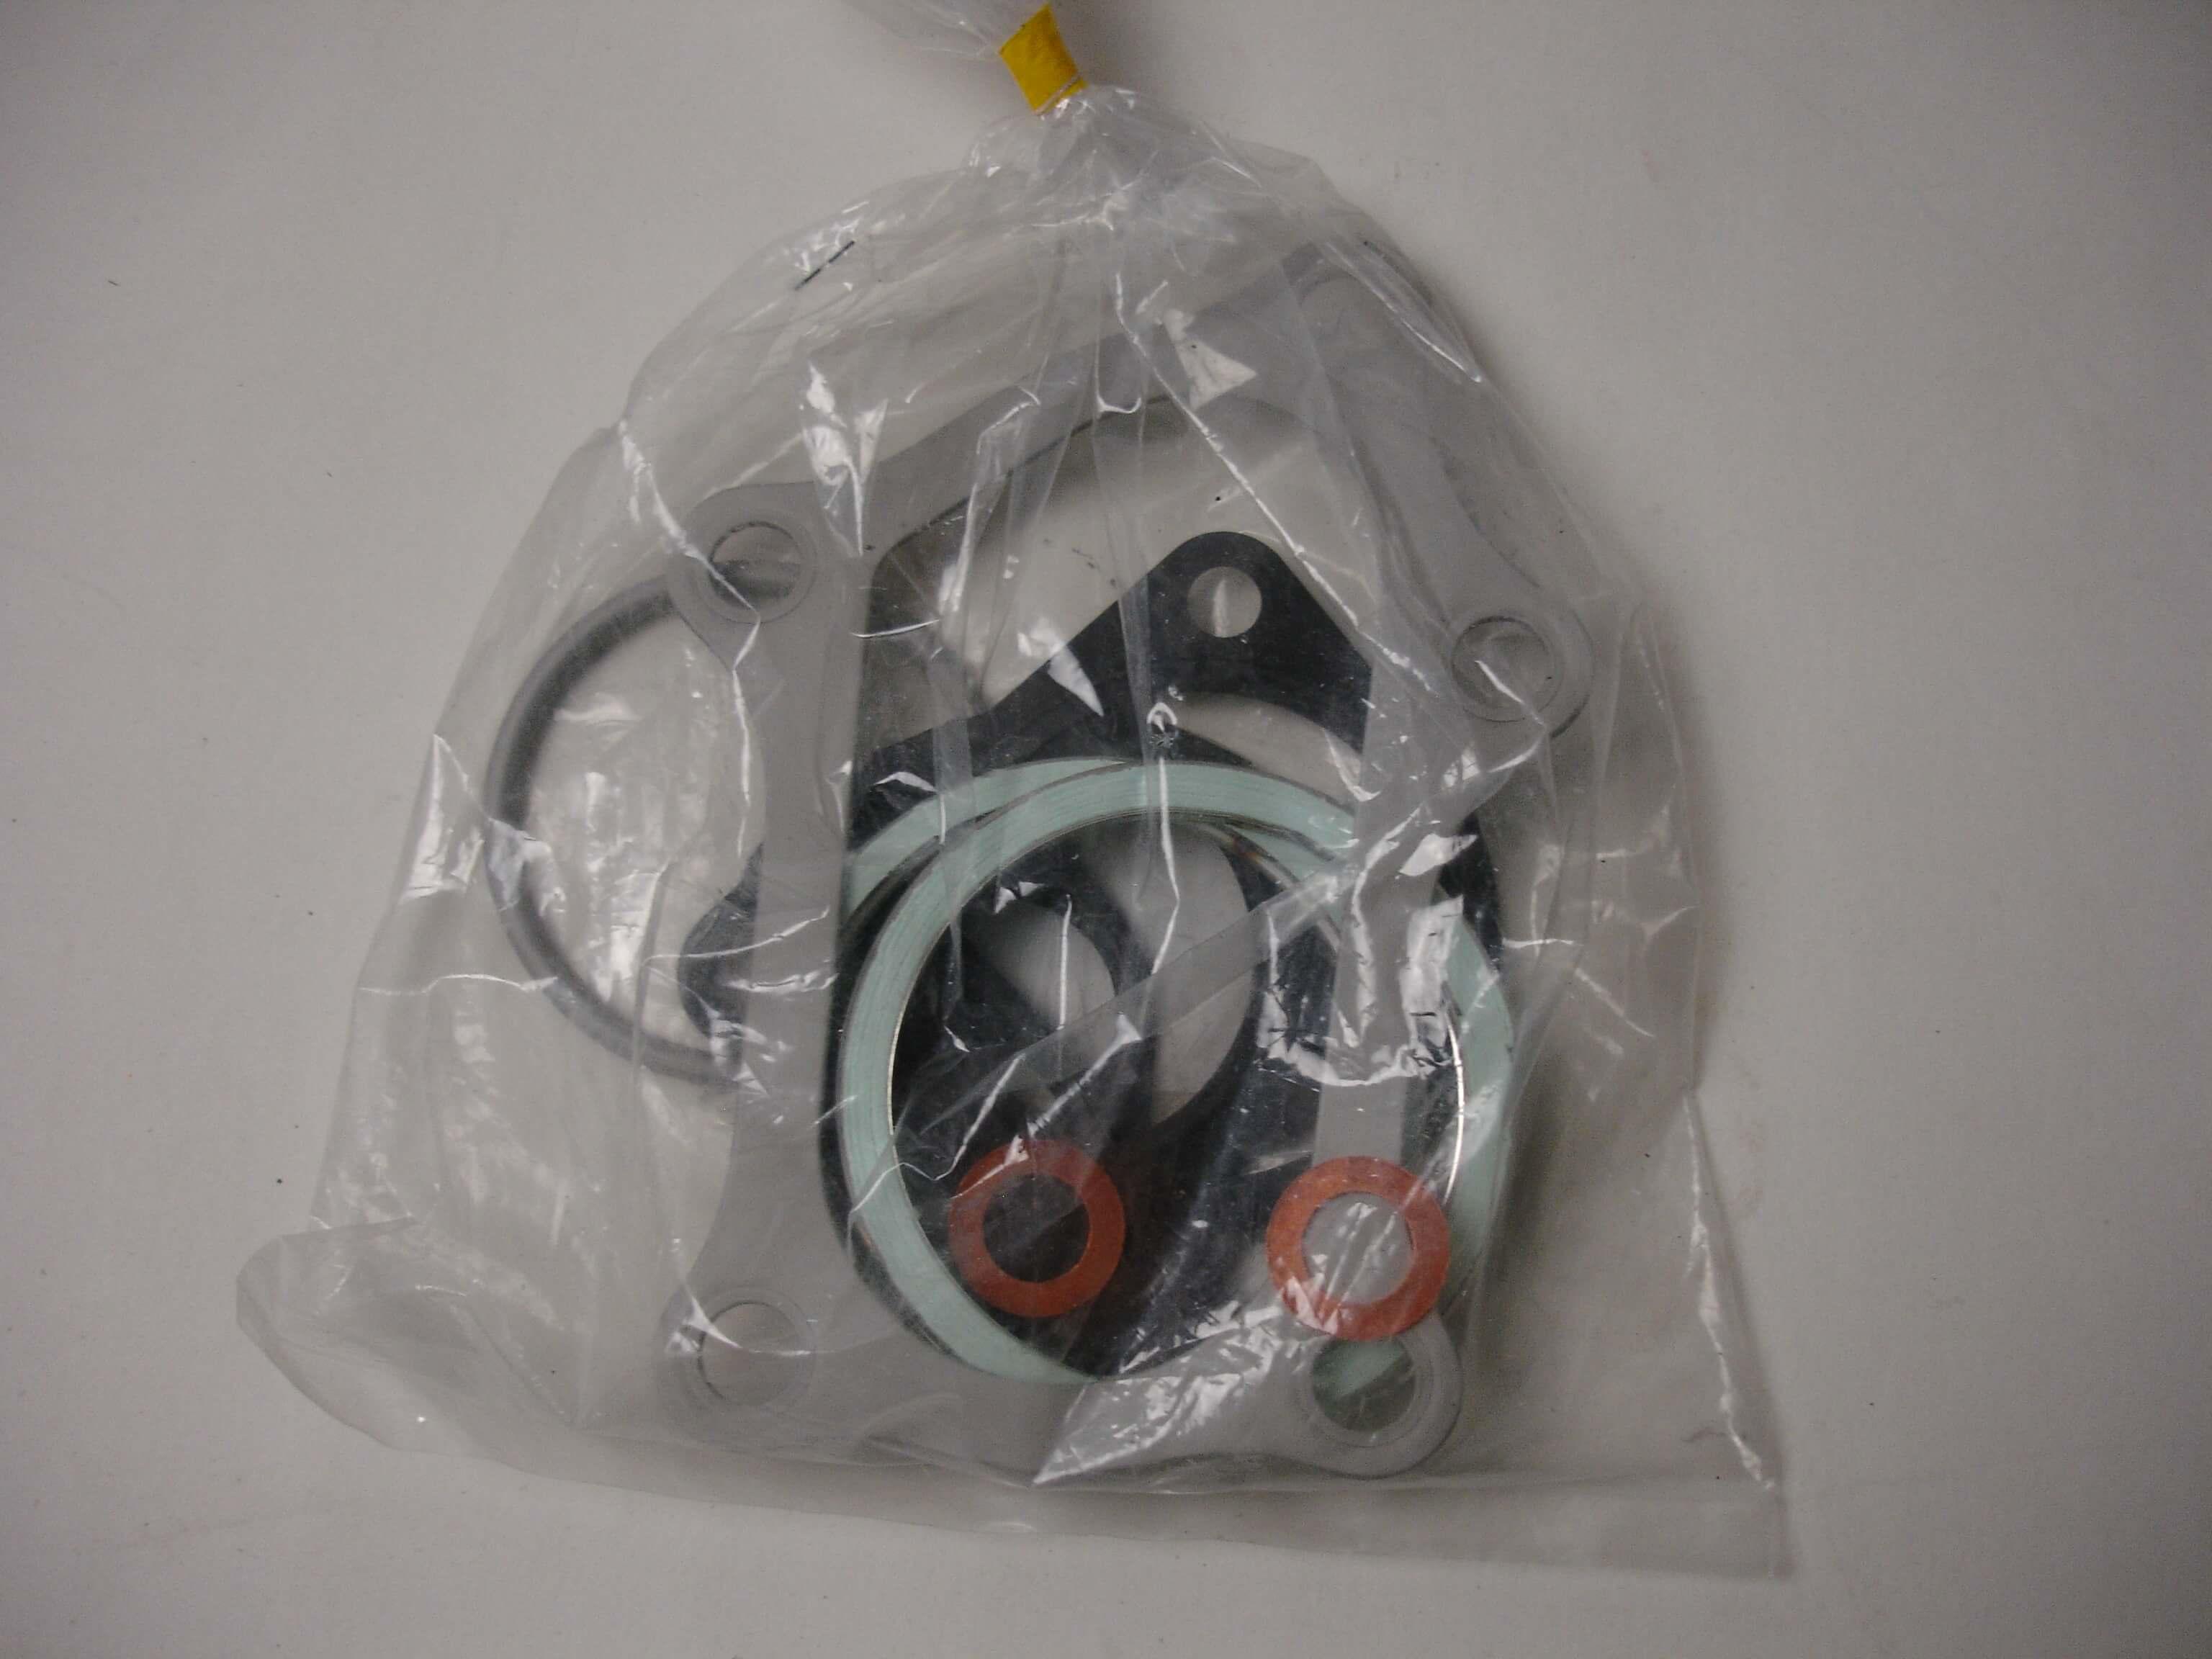 Toyota OEM 1JZ-GTE Turbocharger Gasket Kit 04175-46040 Supra Soarer Mark 2 VVTi